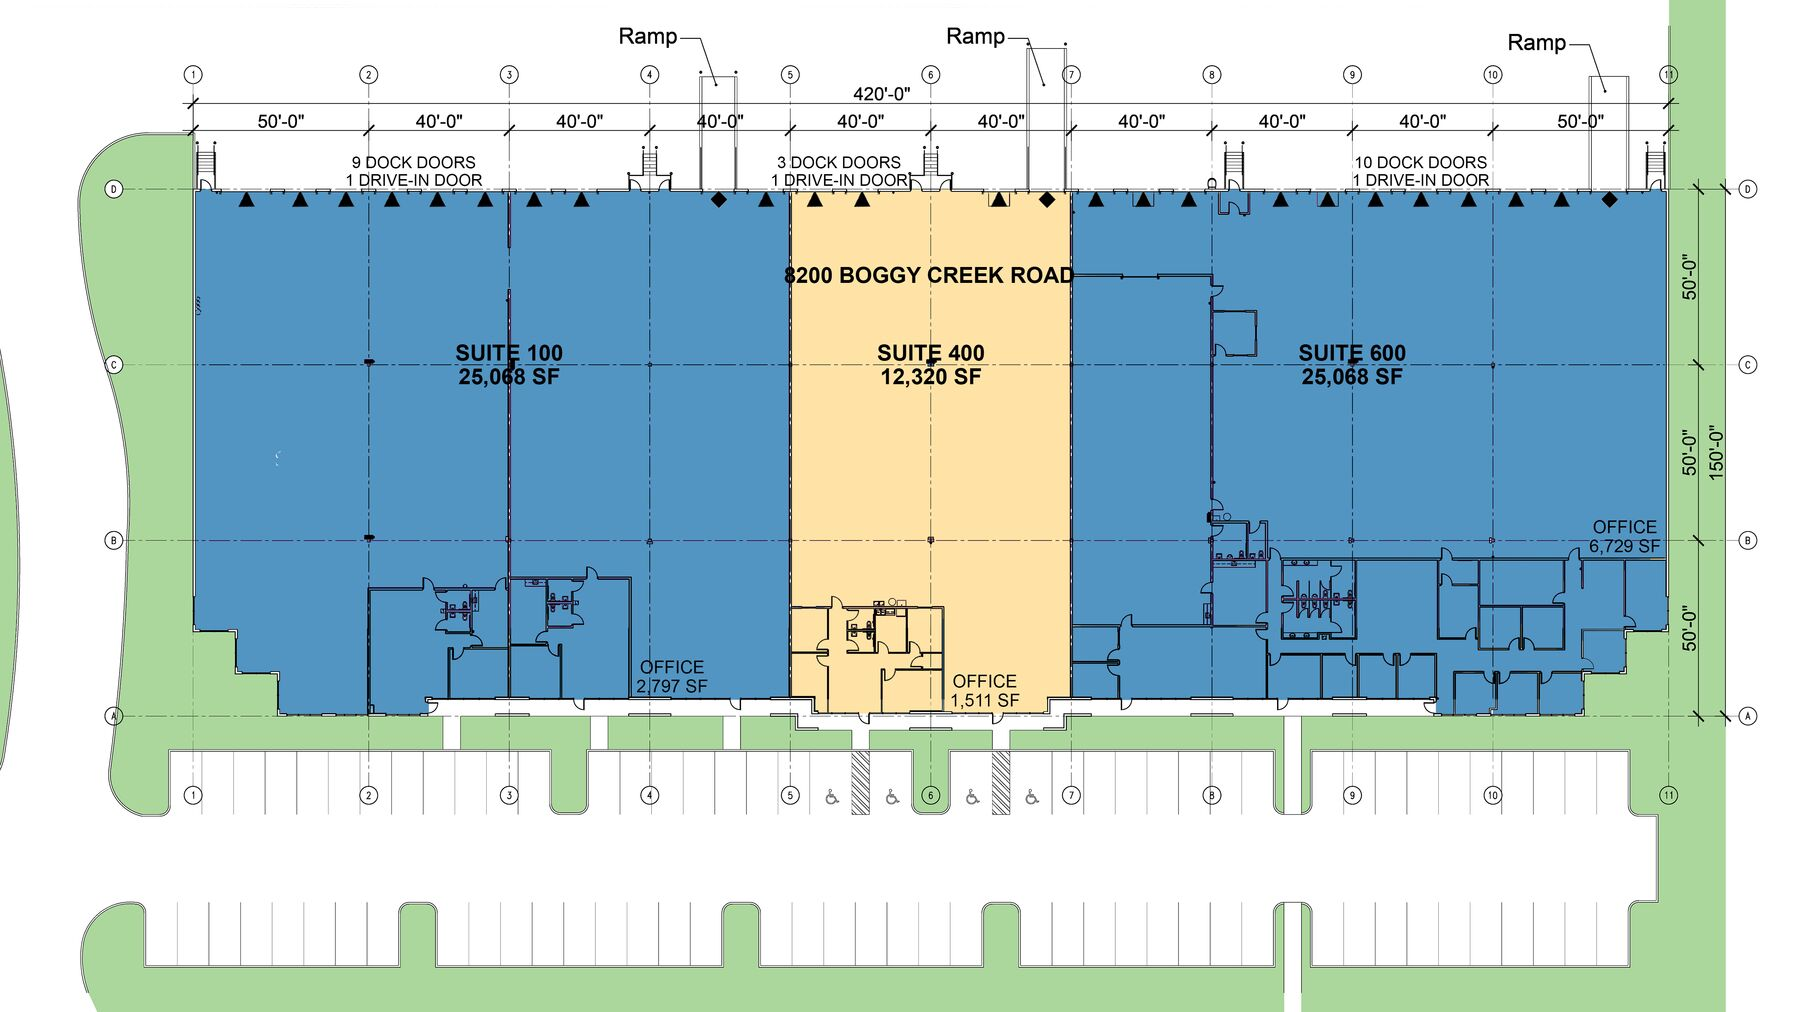 DPM-Airport-DC_8200-Boggy-Creek-Rd_Flyer-Plan.jpg